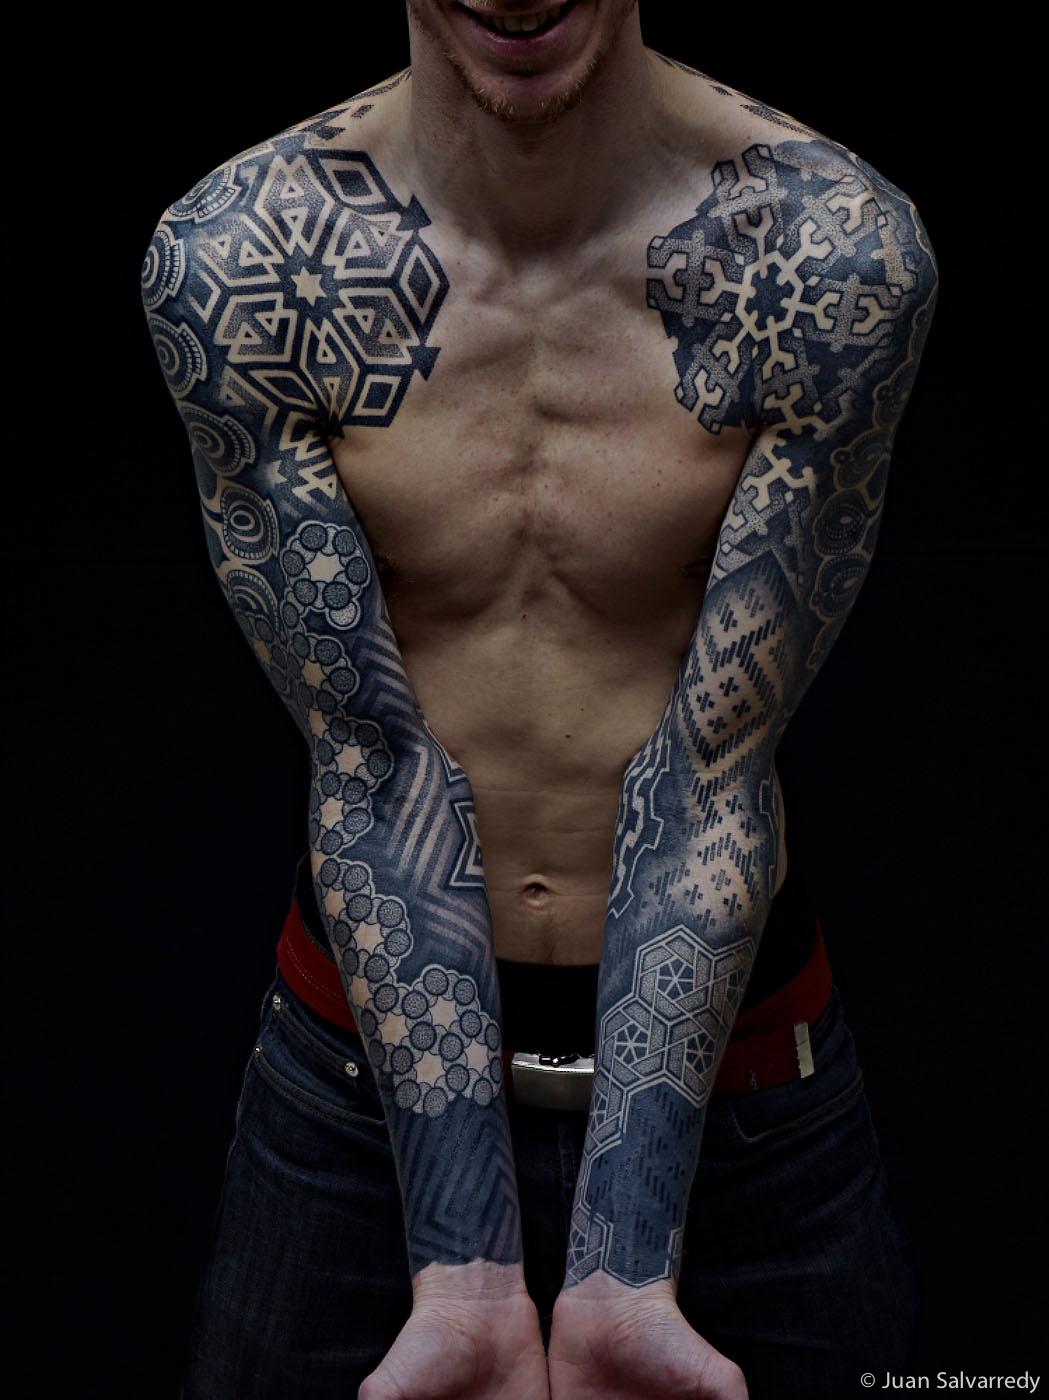 Black Man Tattoo Sleeve: Women Fashion And Lifestyles